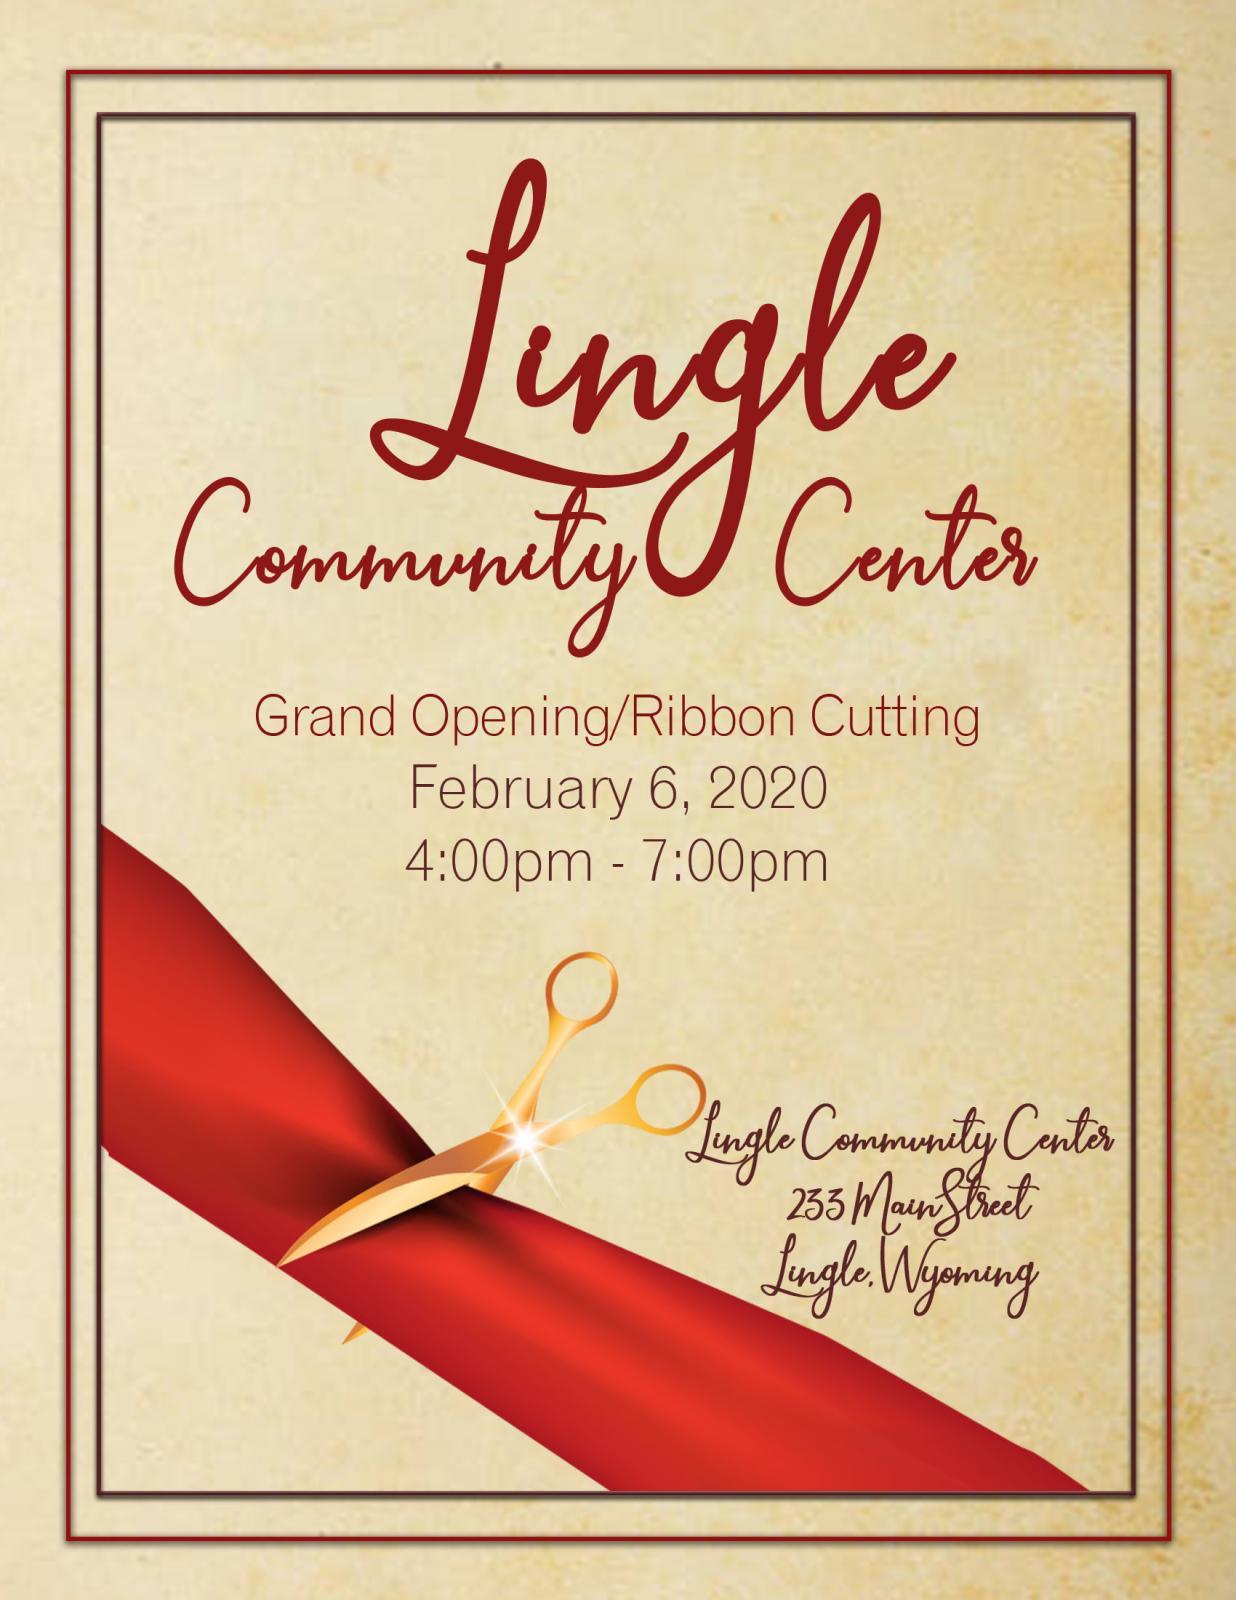 Lingle Community Center Grand Opening Photo